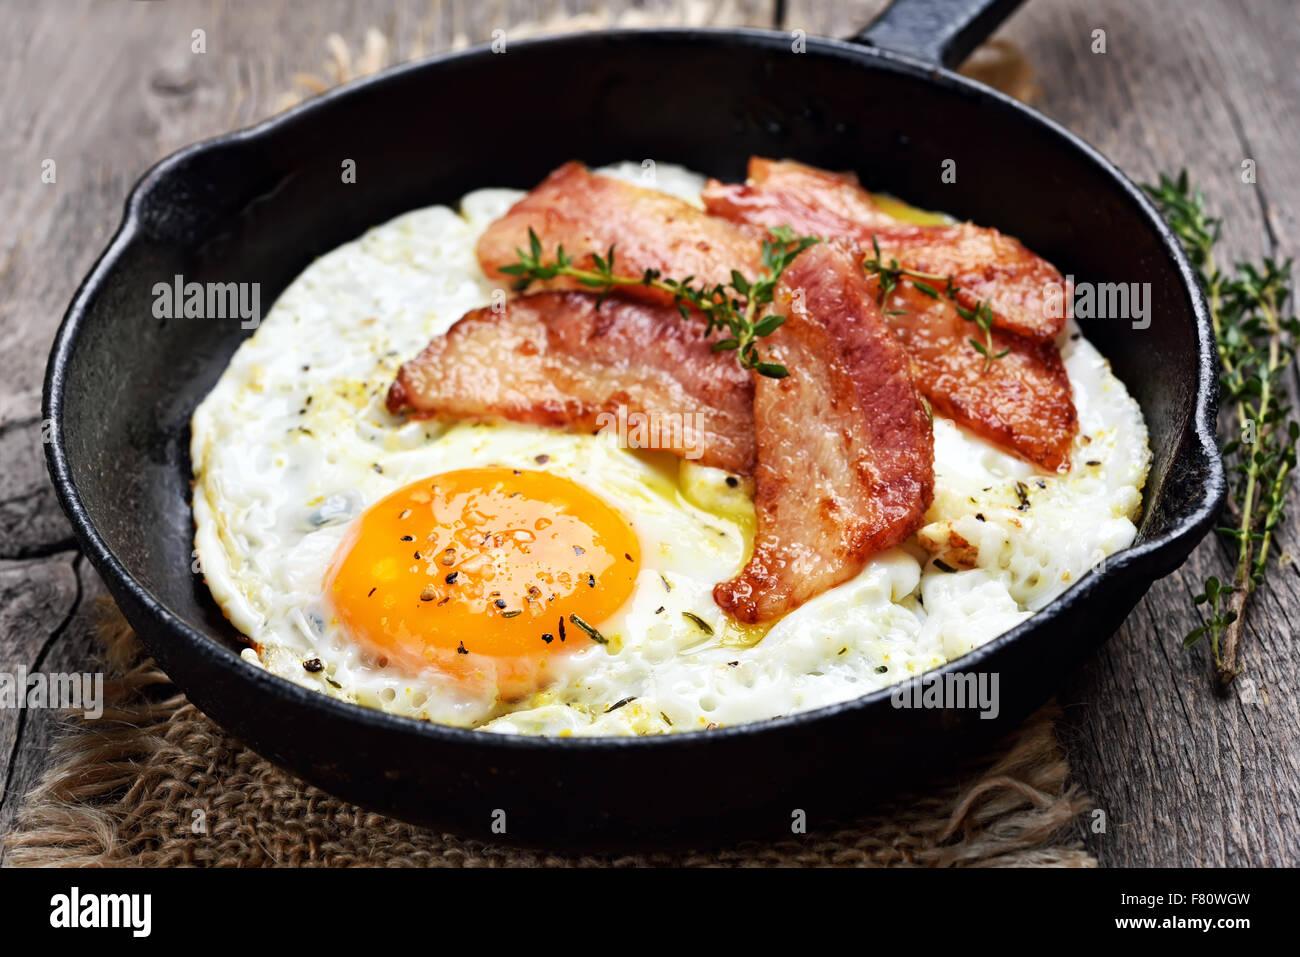 Huevos fritos y tocino, Vista cercana Imagen De Stock